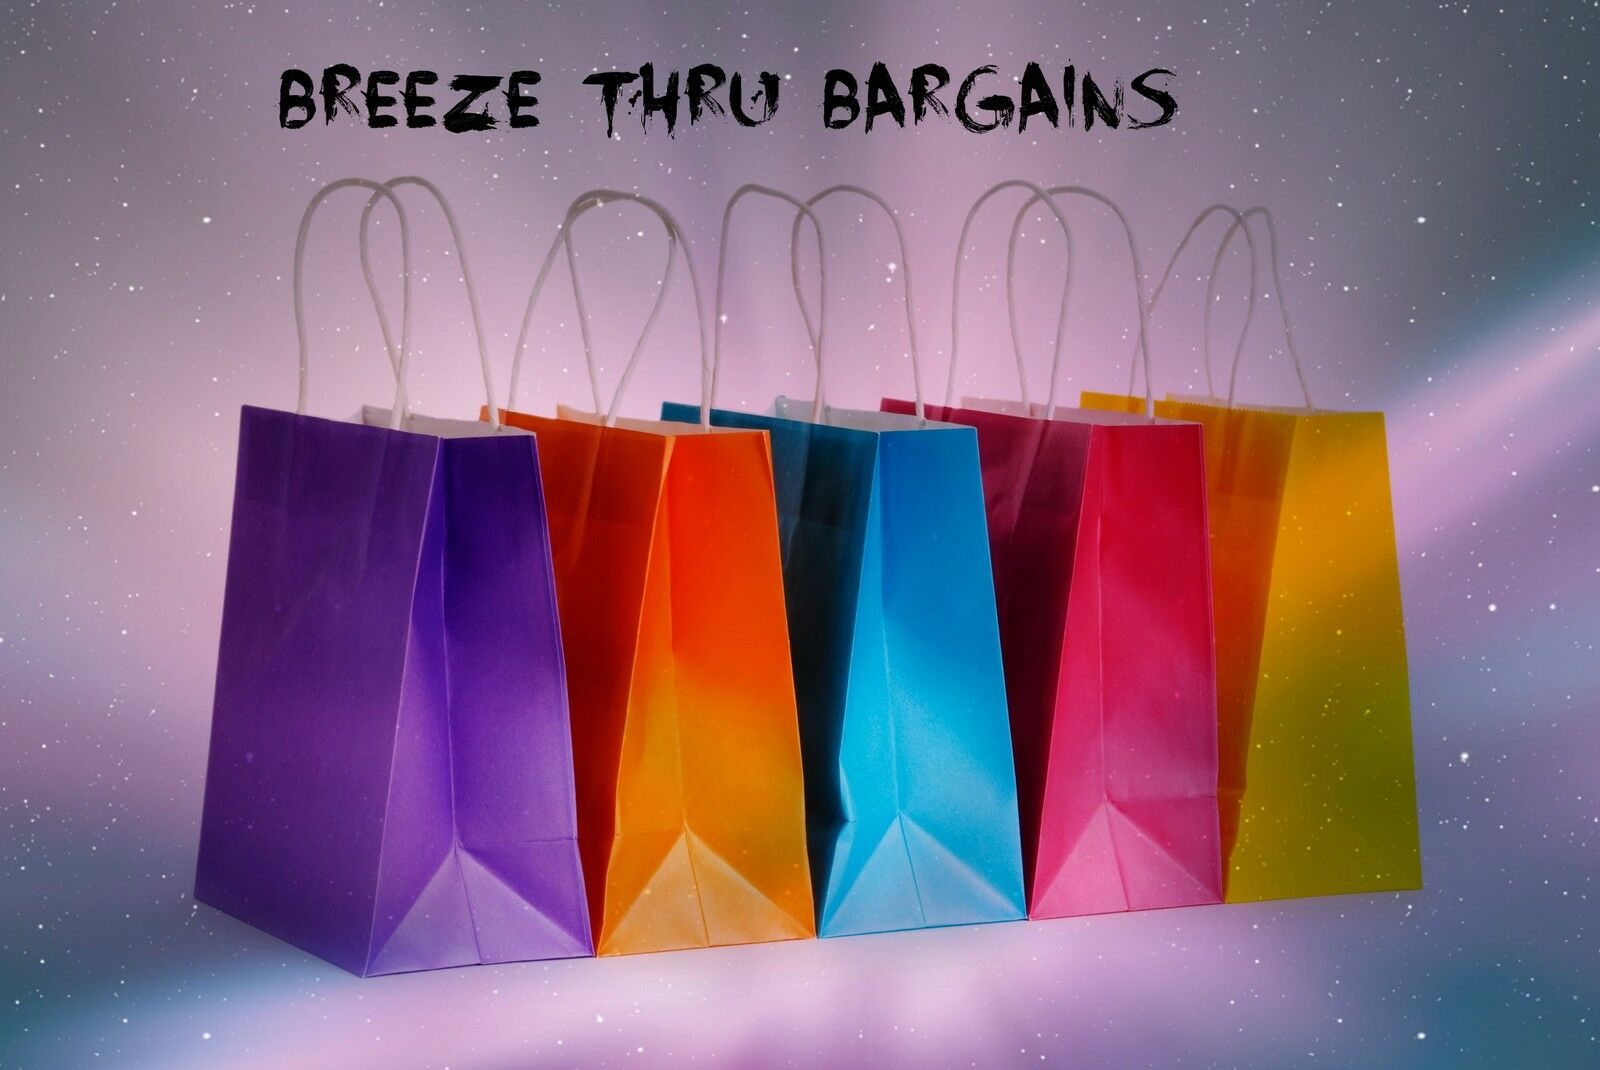 Breeze Thru Bargains